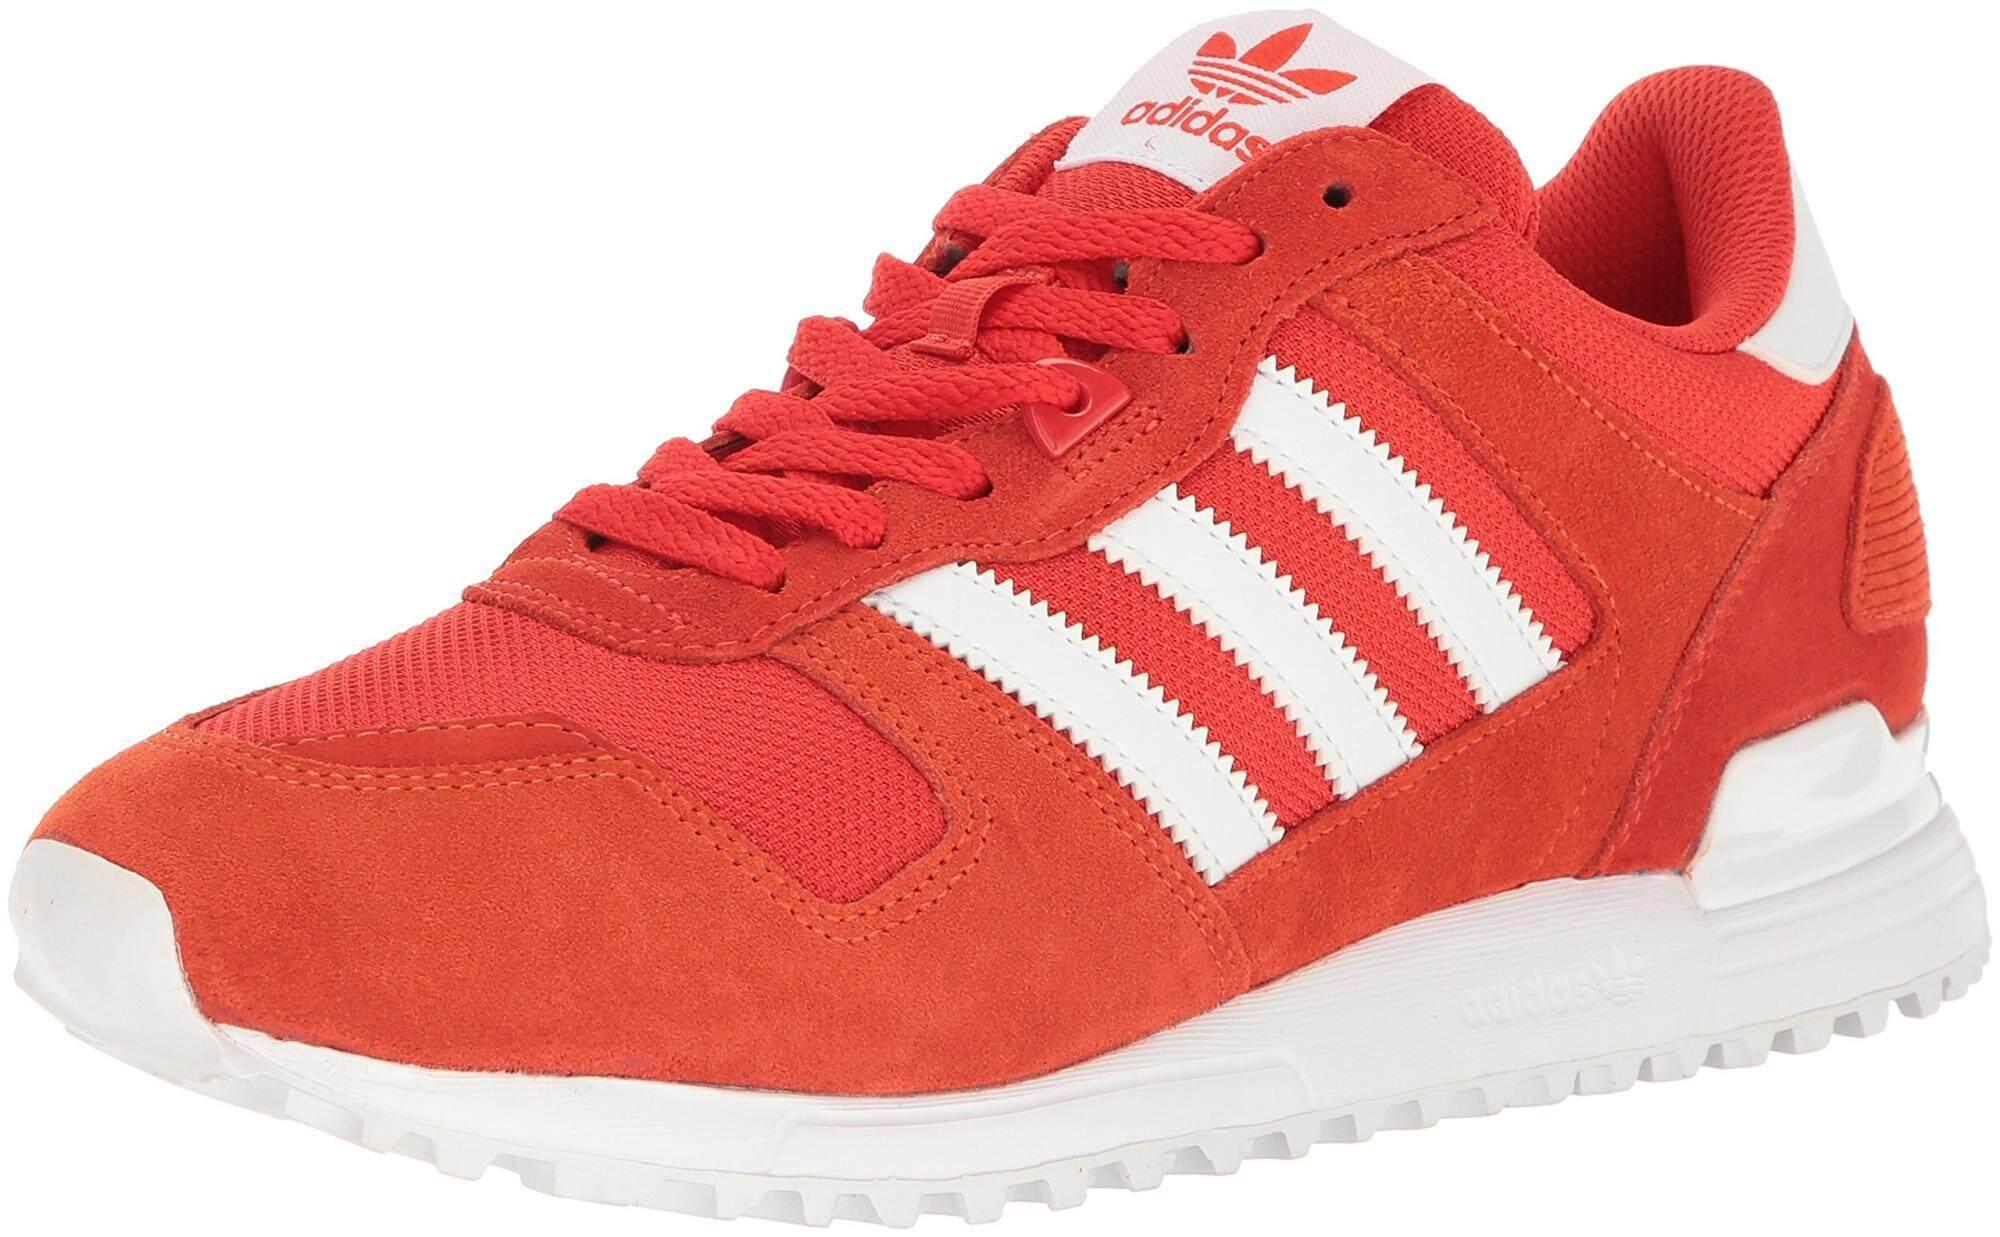 adidas-originals-men39s-zx-700-running-shoe-core-redwhiteenergy-12-m-us-6487-07621213-8d17c14e432a877d6315d9e4e5411d19- Kumpulan List Harga Sepatu Adidas Zx 700 Terbaru waktu ini